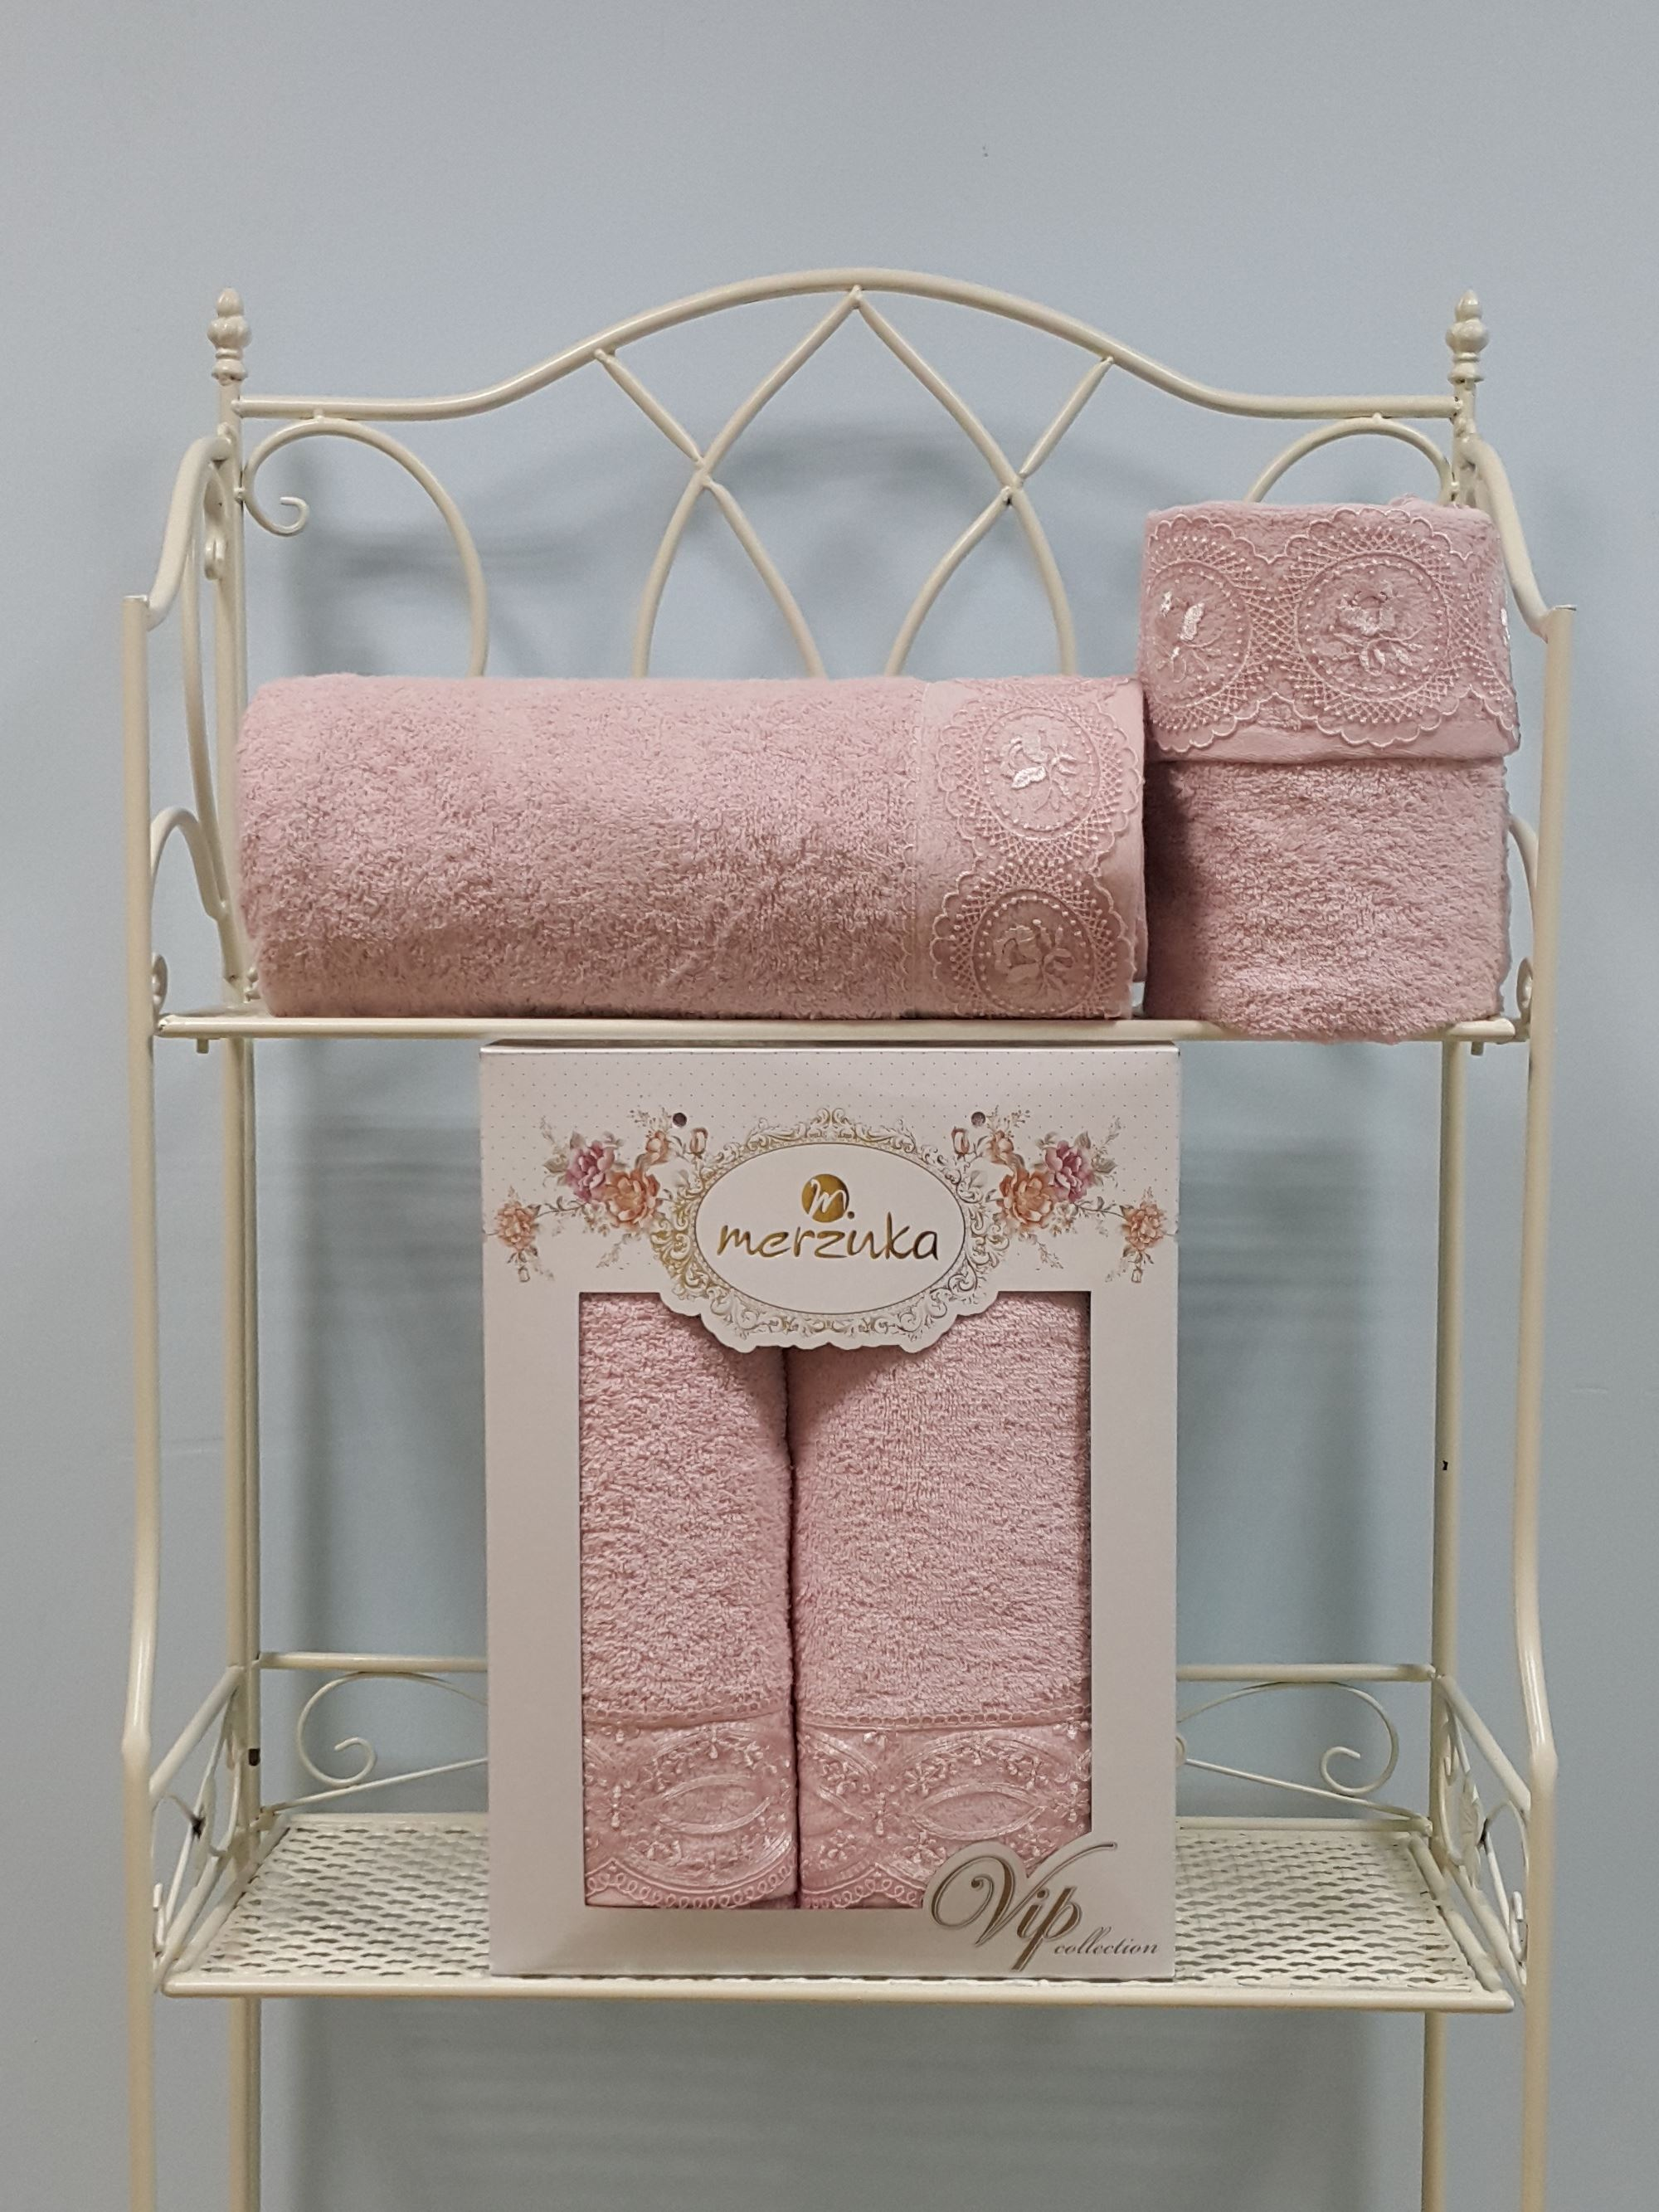 Полотенца Oran Merzuka Набор из 2 полотенец Elit Цвет: Розовый набор из 2 полотенец merzuka sakura 50х90 70х140 8430 кремовый